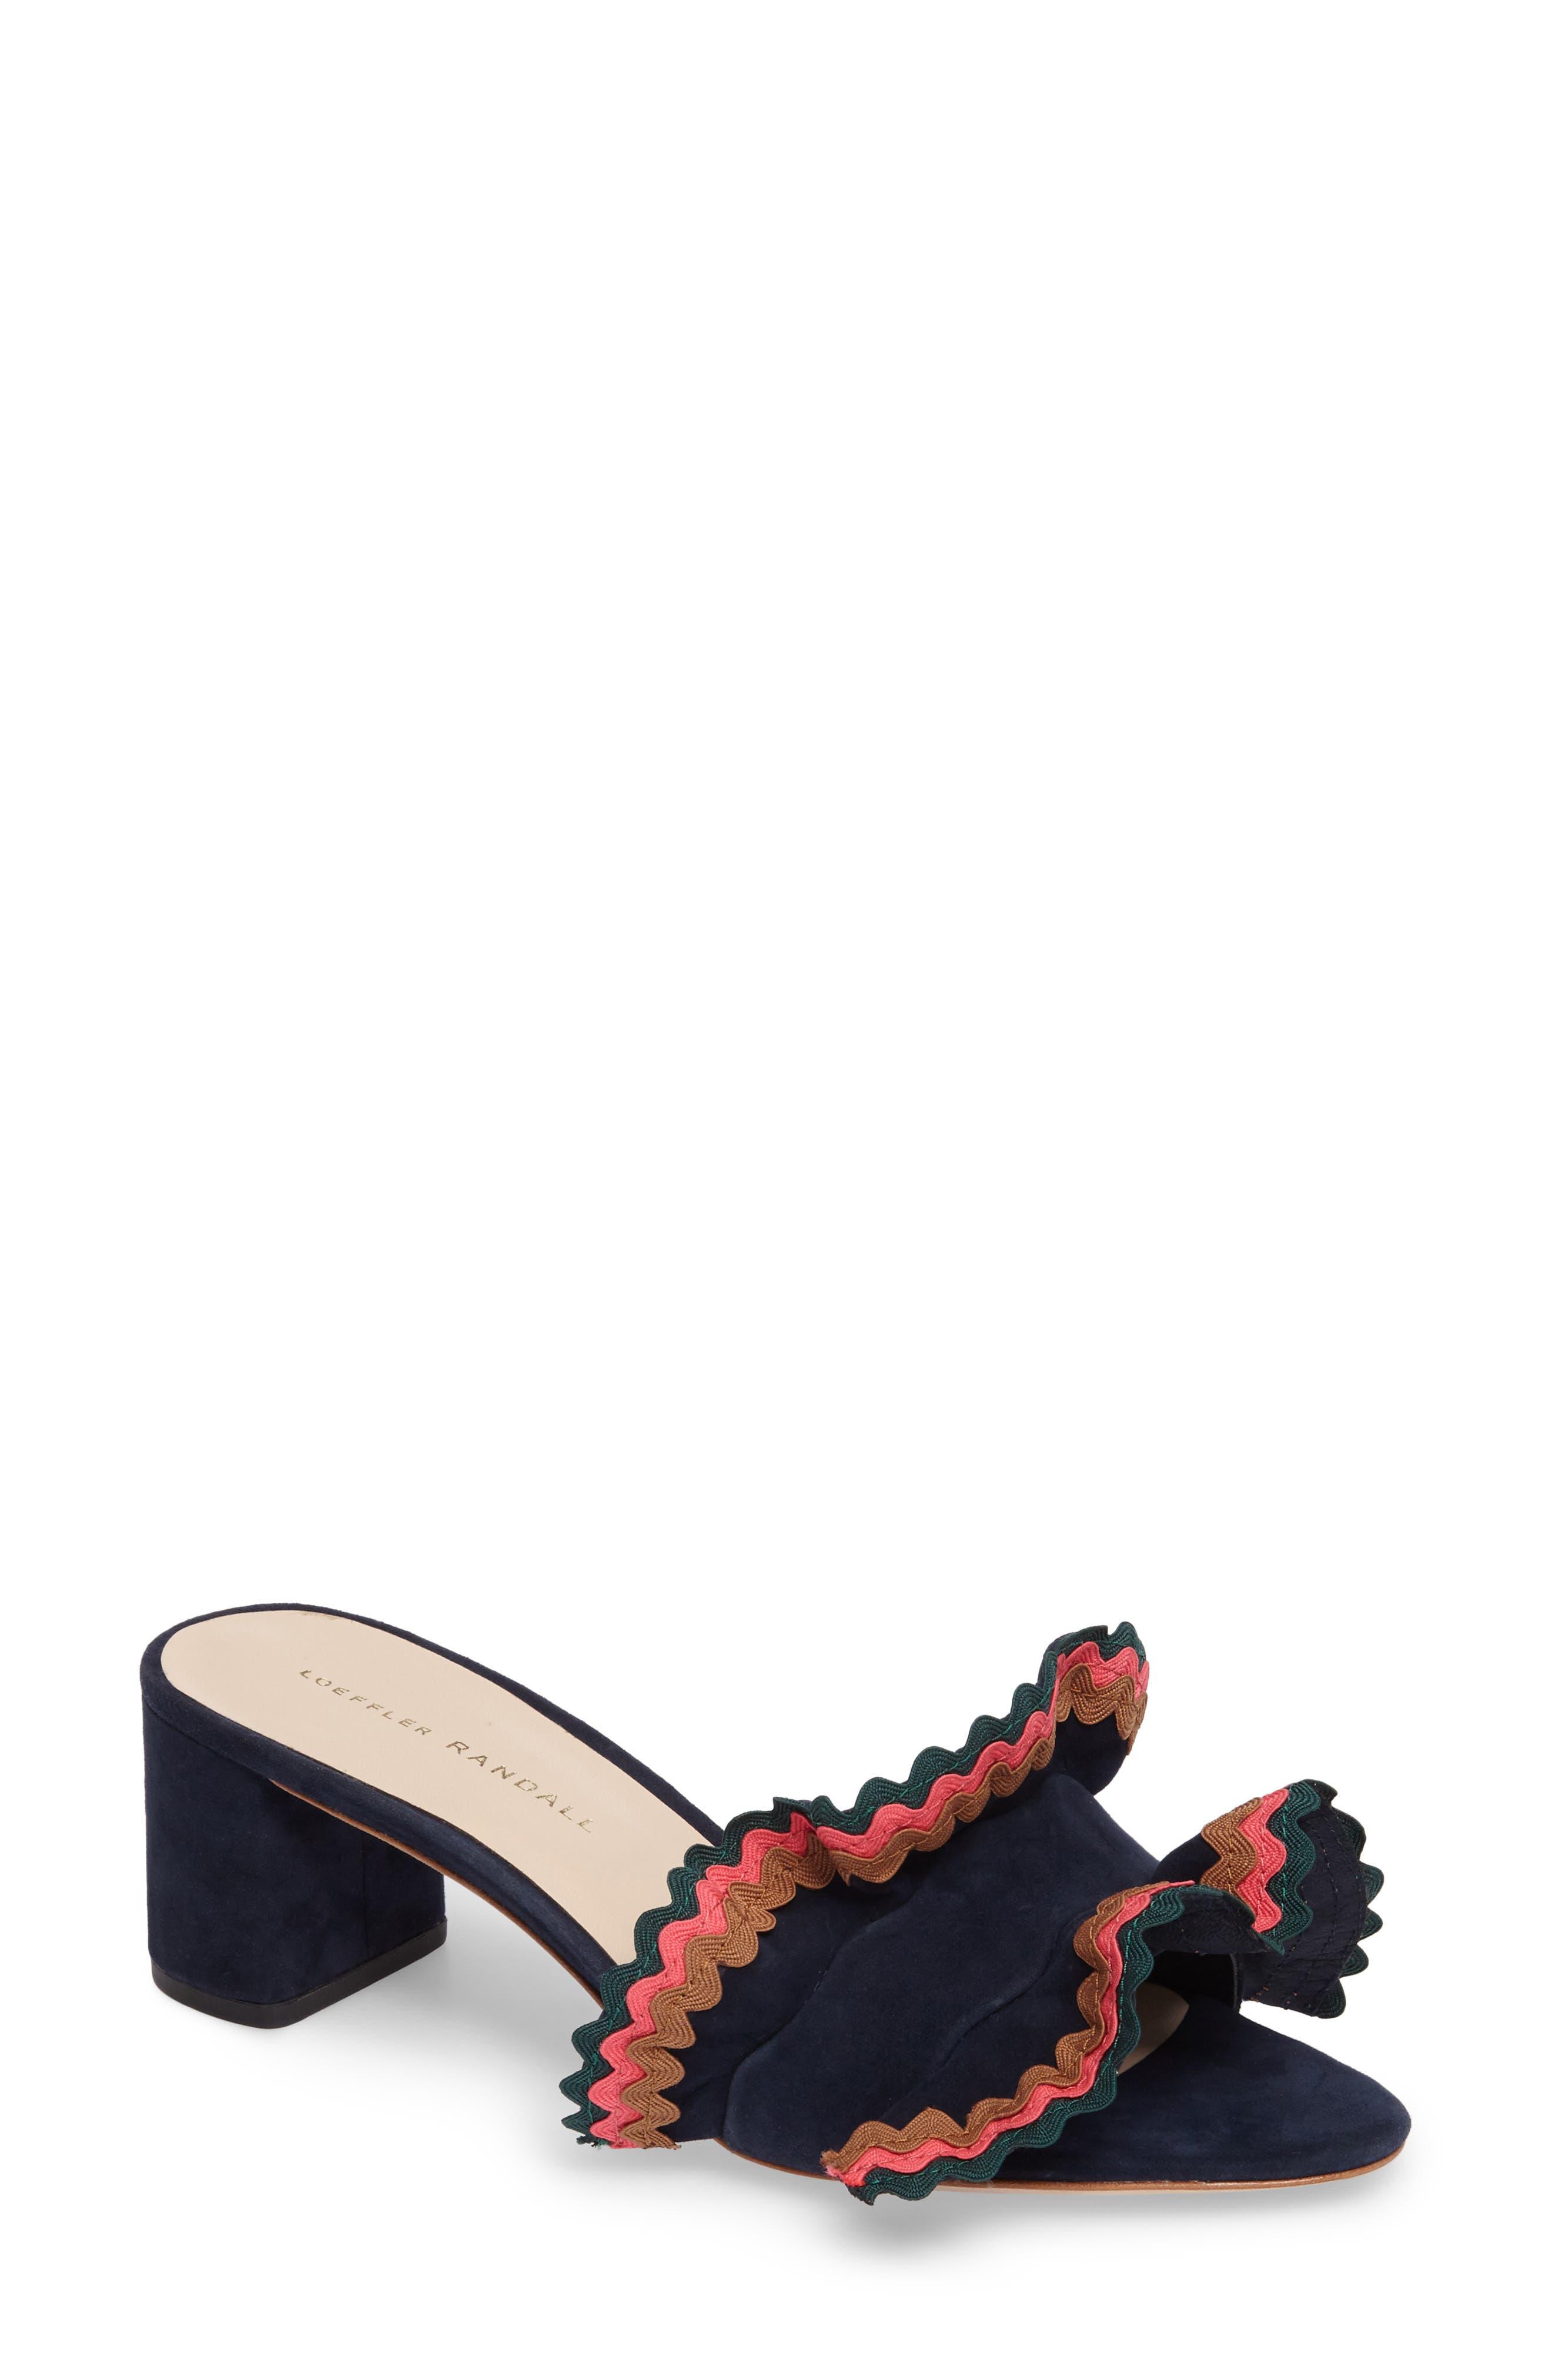 Vera Ruffled Slide Sandal,                             Main thumbnail 1, color,                             499